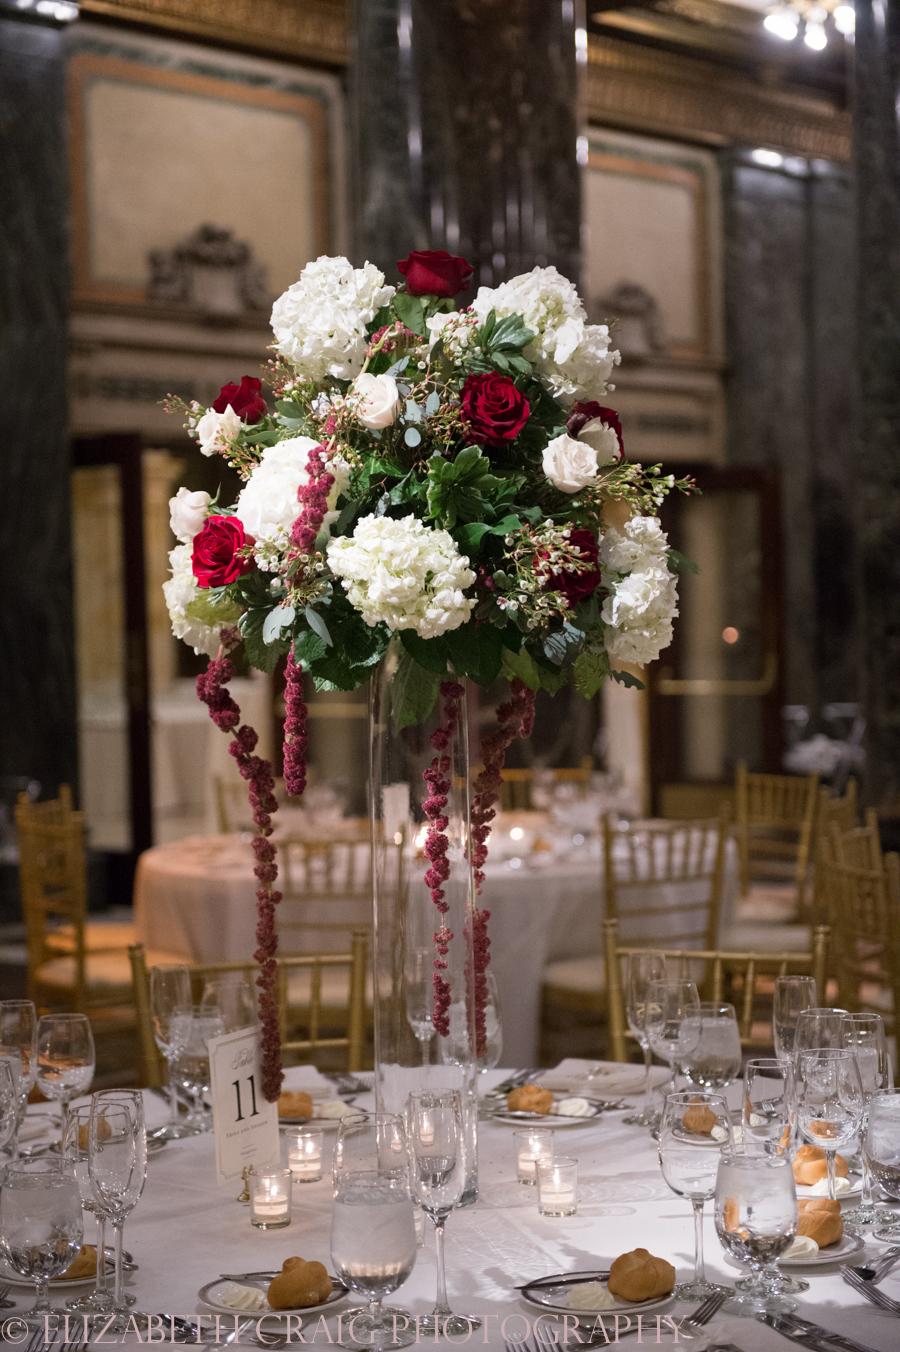 Carnegie Museum of Art Weddings | Elizabeth Craig Photography-0093